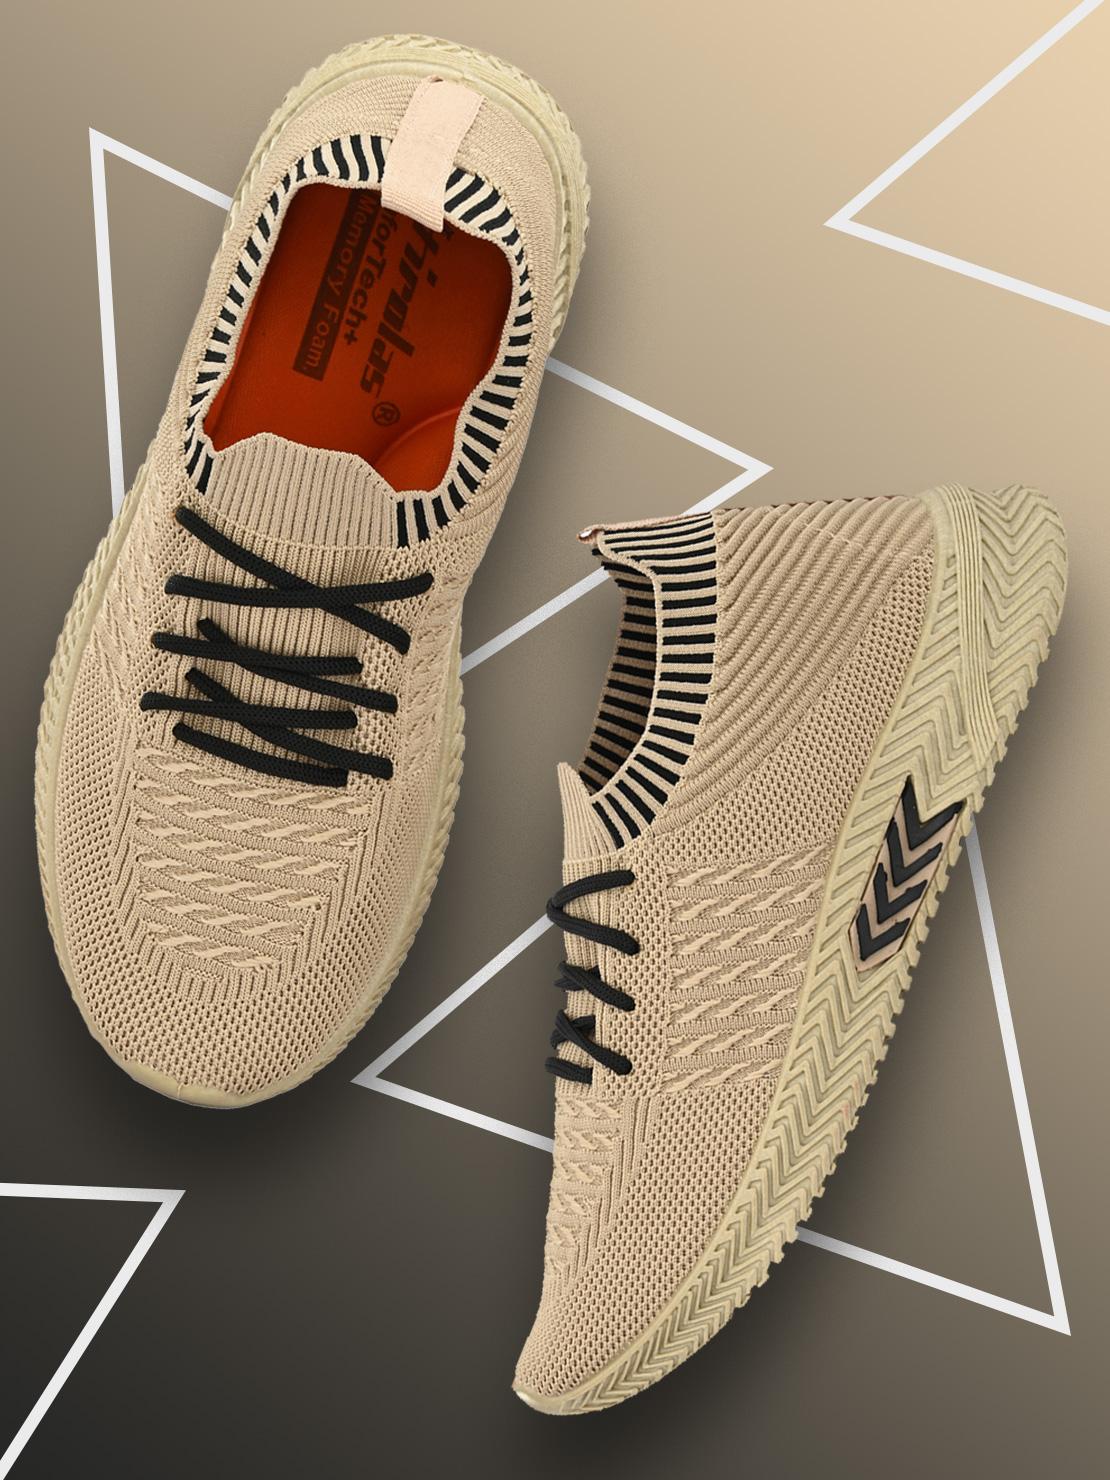 Hirolas   Hirolas® Men's Beige Knitted Running/Gym/Walking athleisure Sports Sneaker Shoes